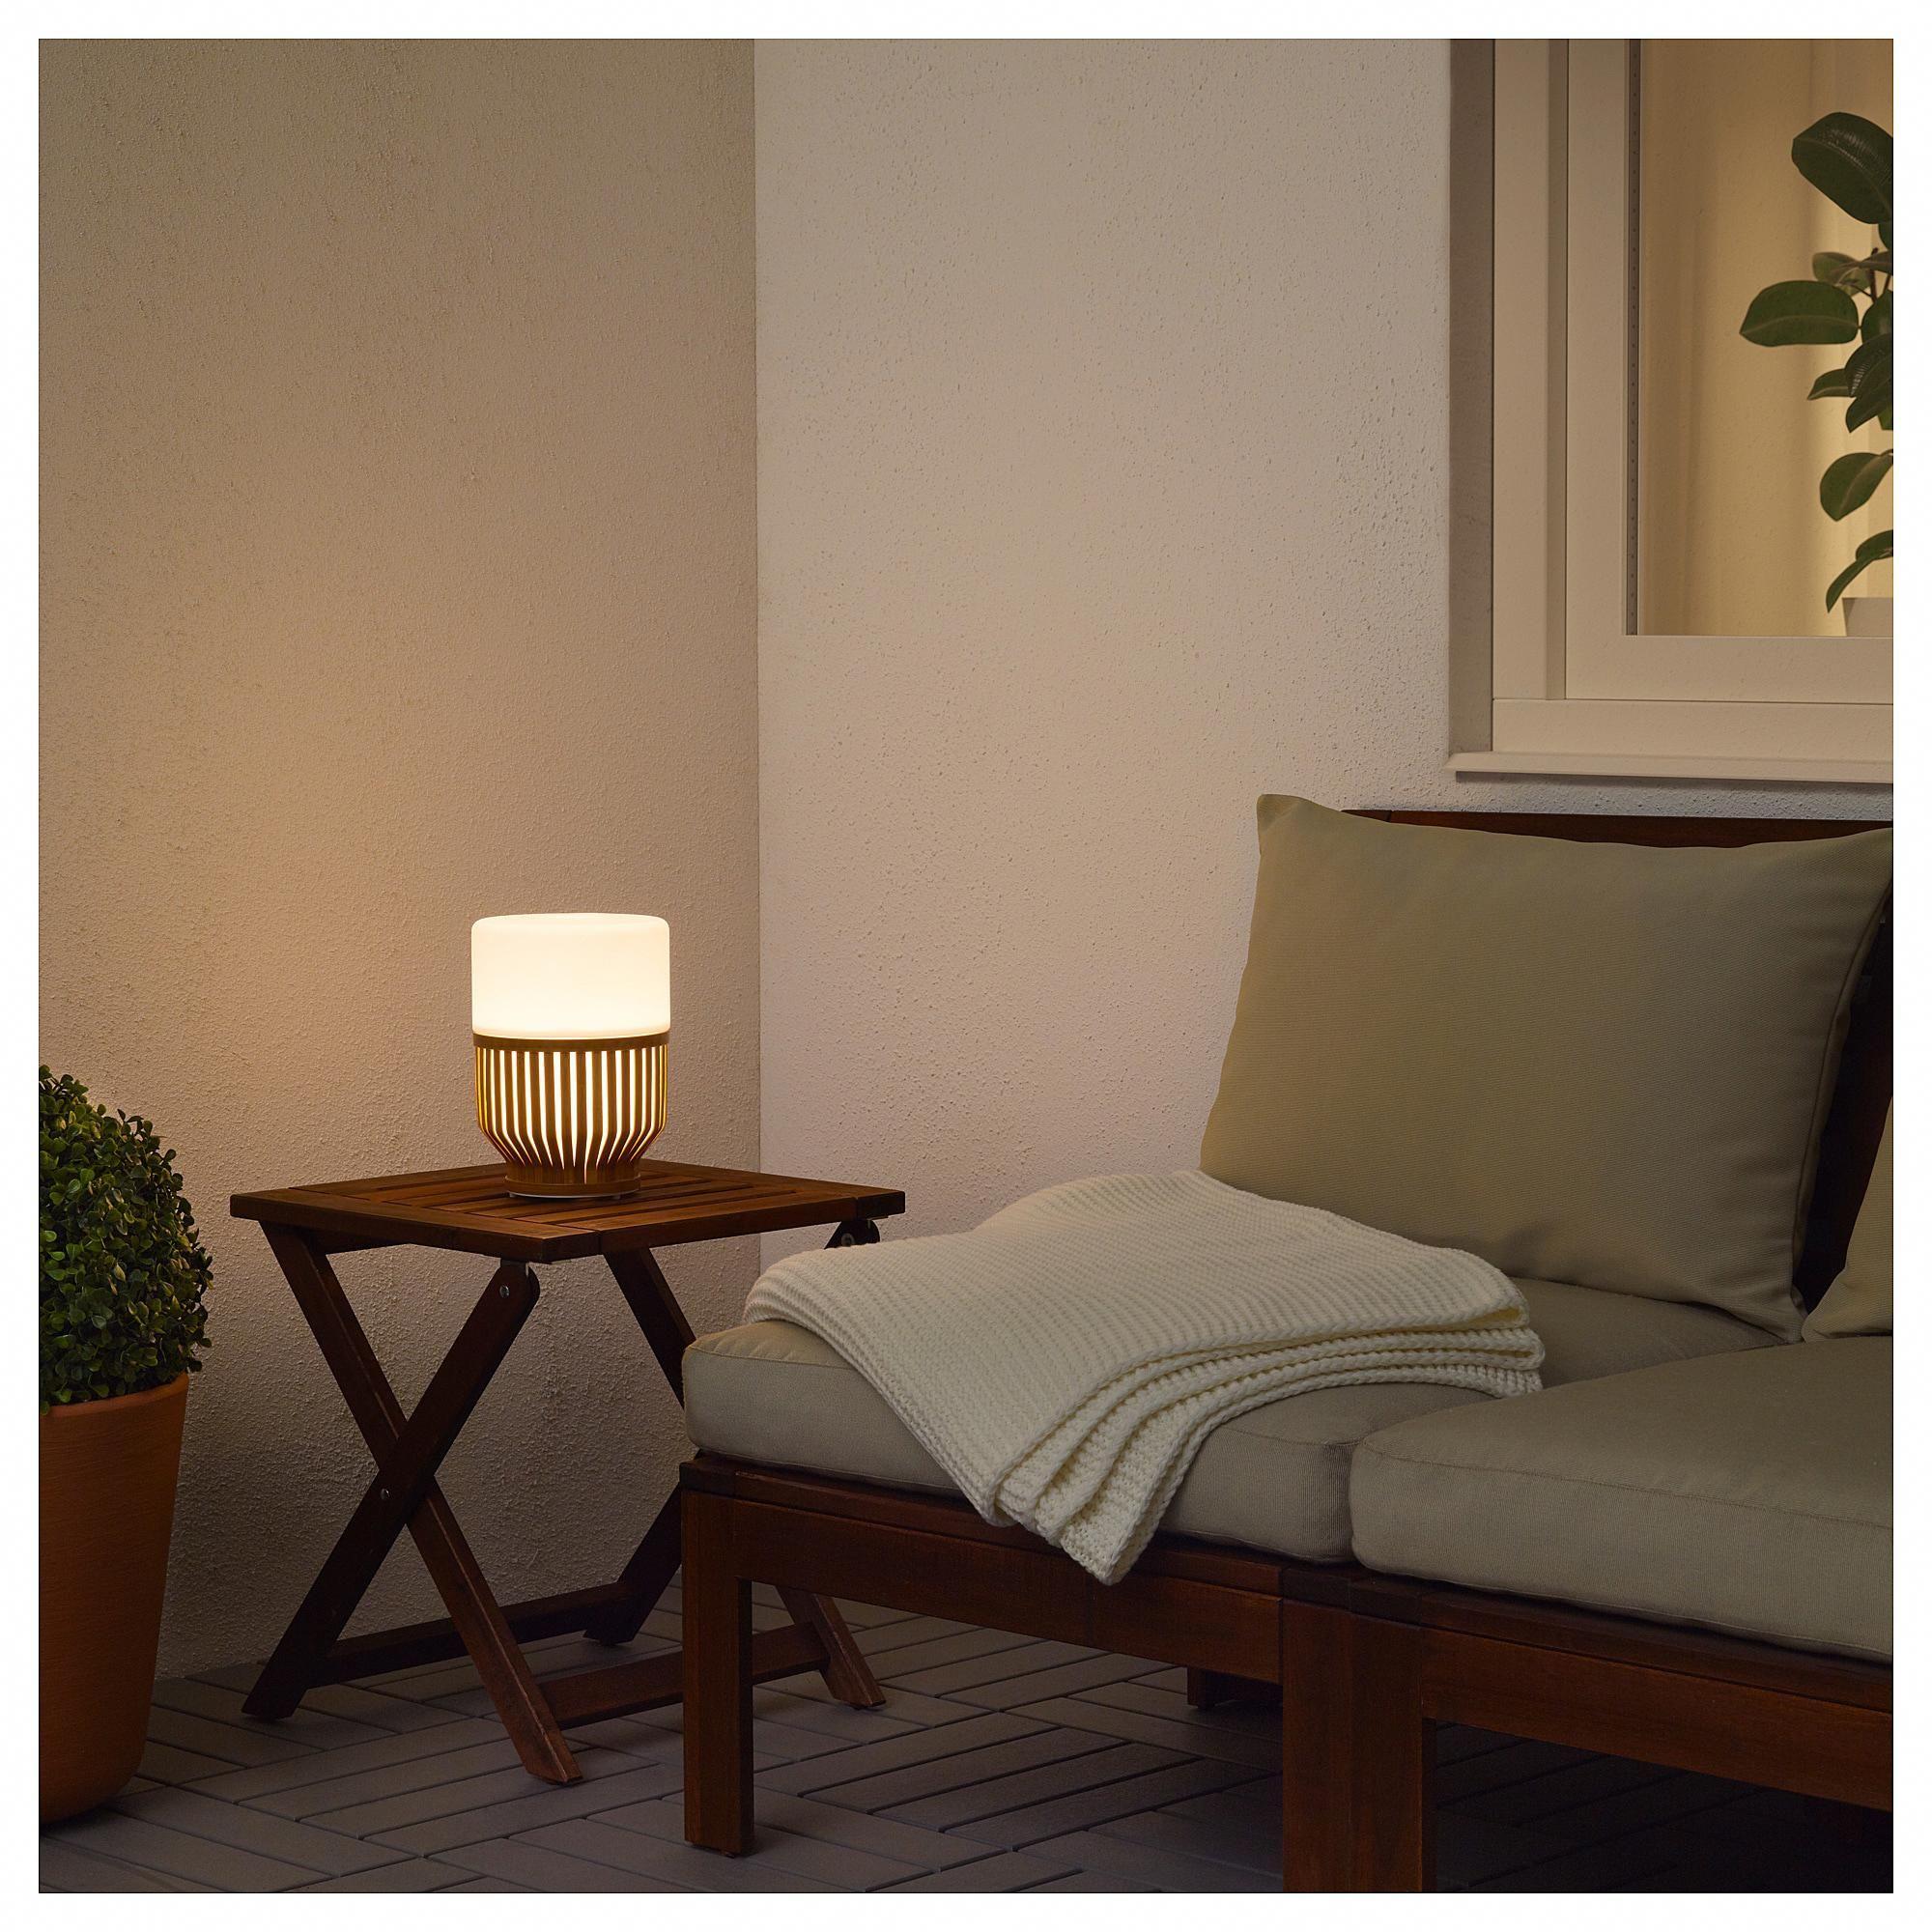 MULLBACKA LED table lamp IKEA #solarpanels,solarenergy